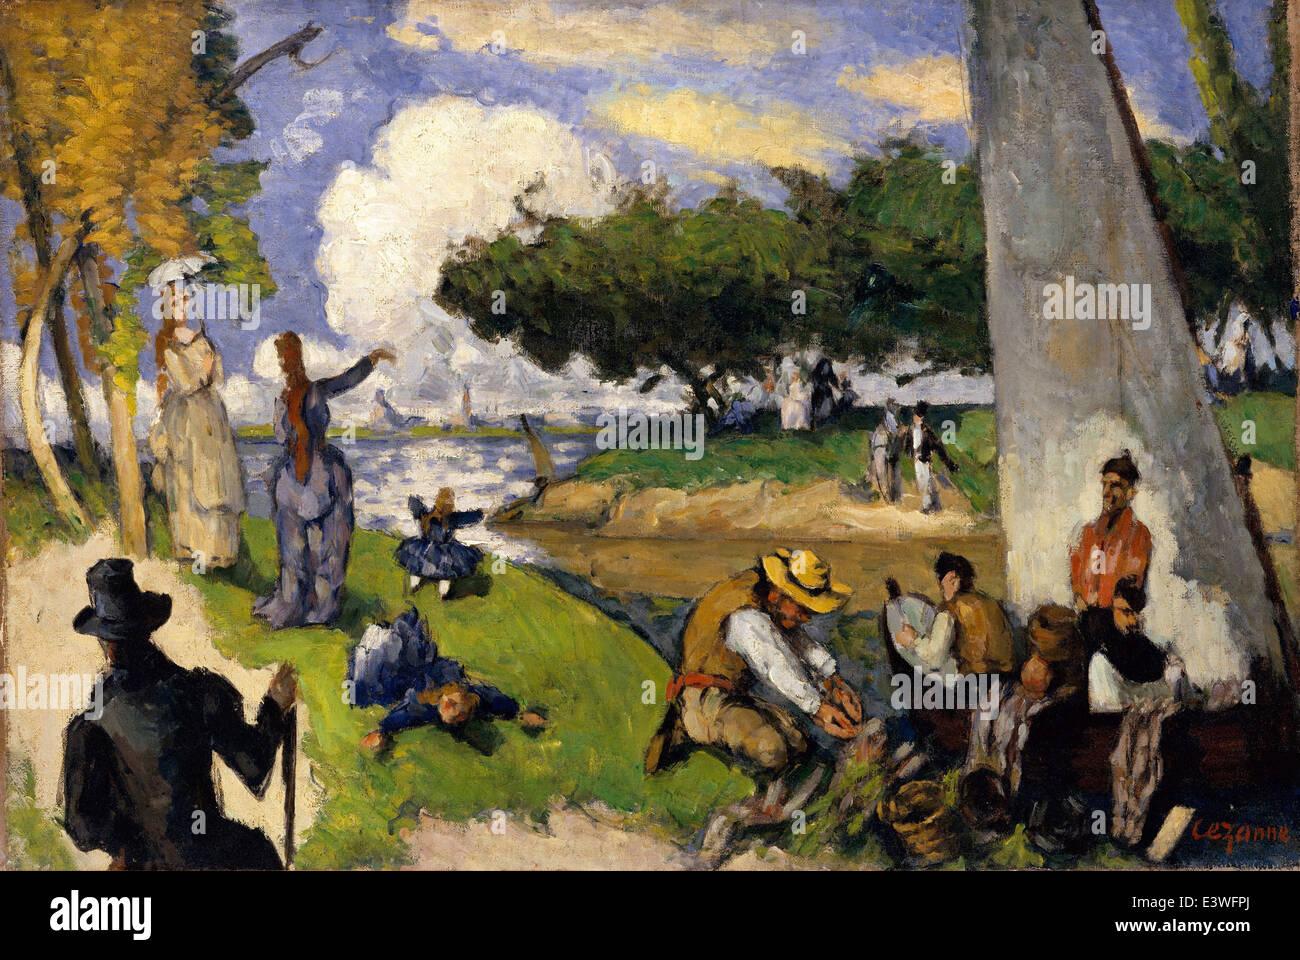 Paul Cézanne - The Fishermen (Fantastic Scene) - 1875 - MET Museum - New-York - Stock Image